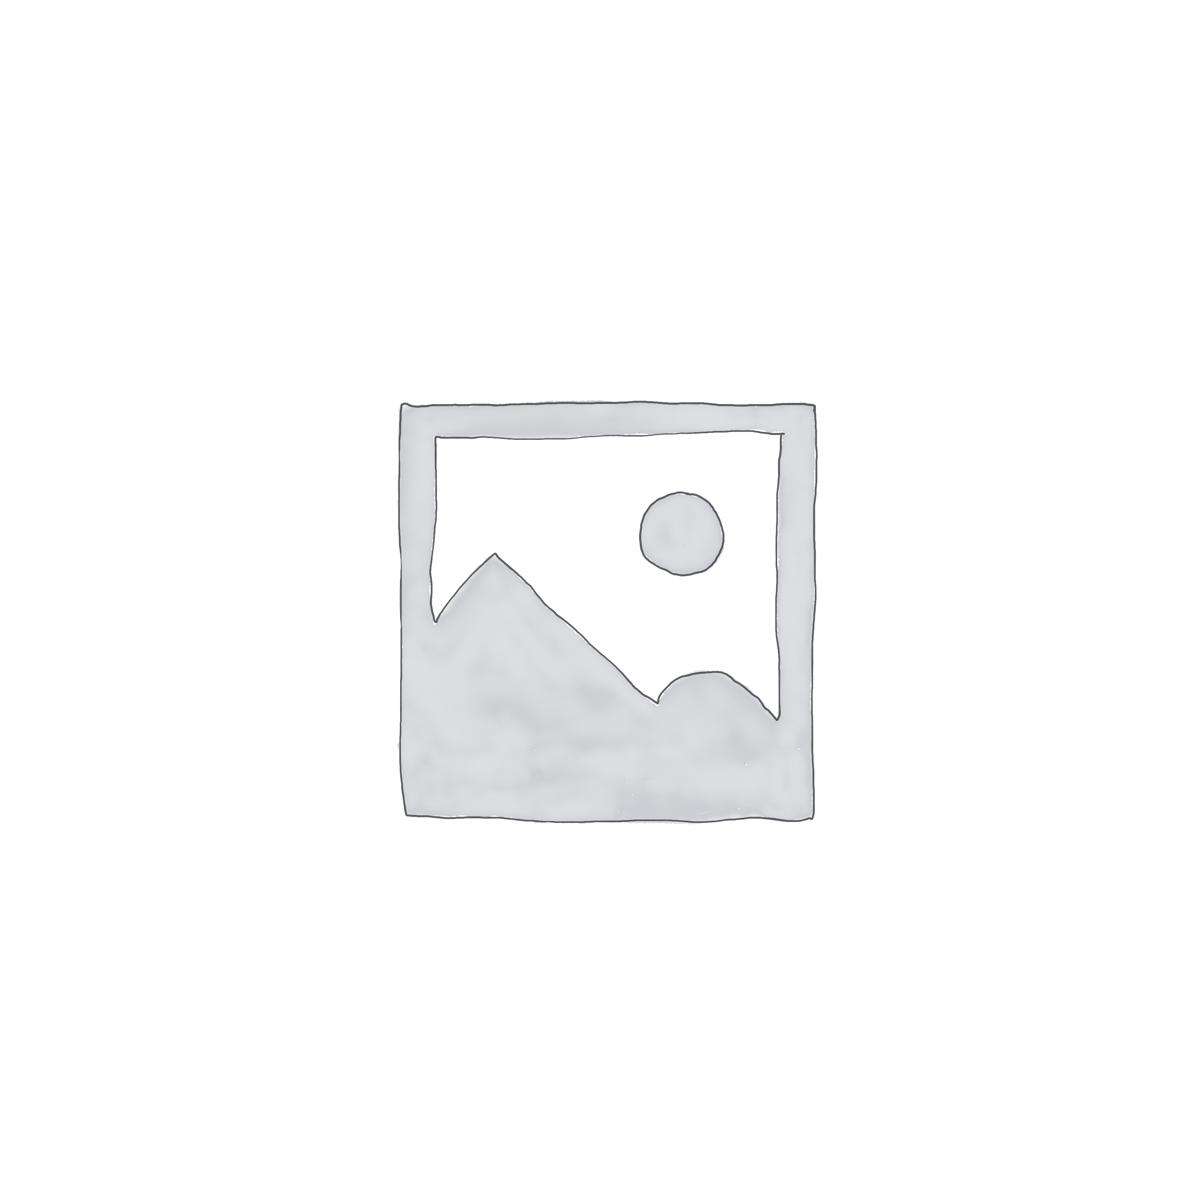 White Tropical Leafy Wallpaper Mural